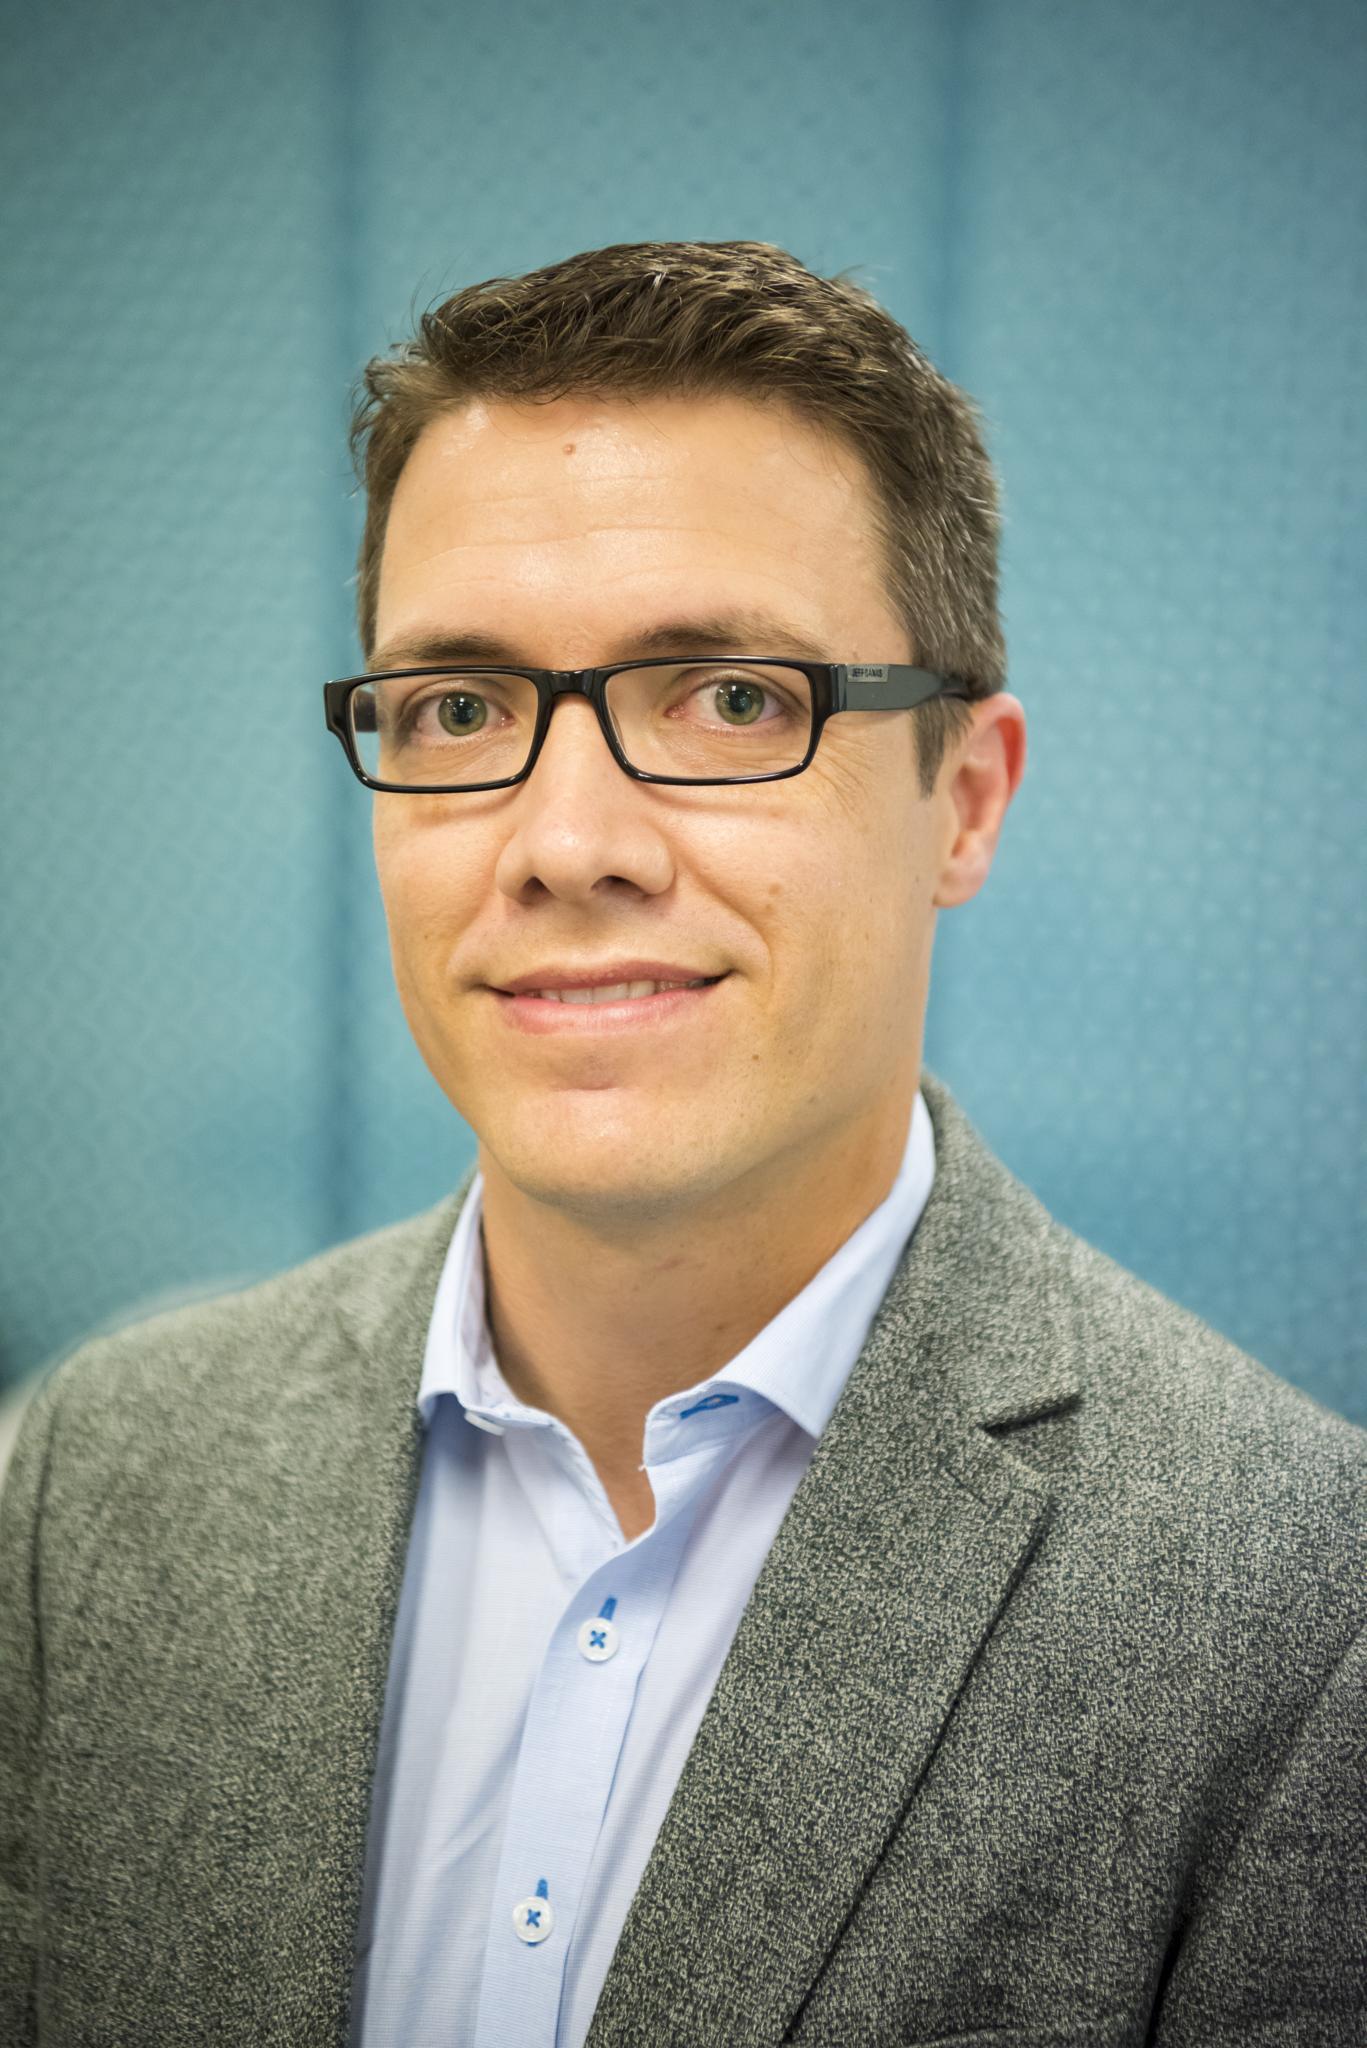 Dr Peter Hendy - Bsc, MBBS, FRACP